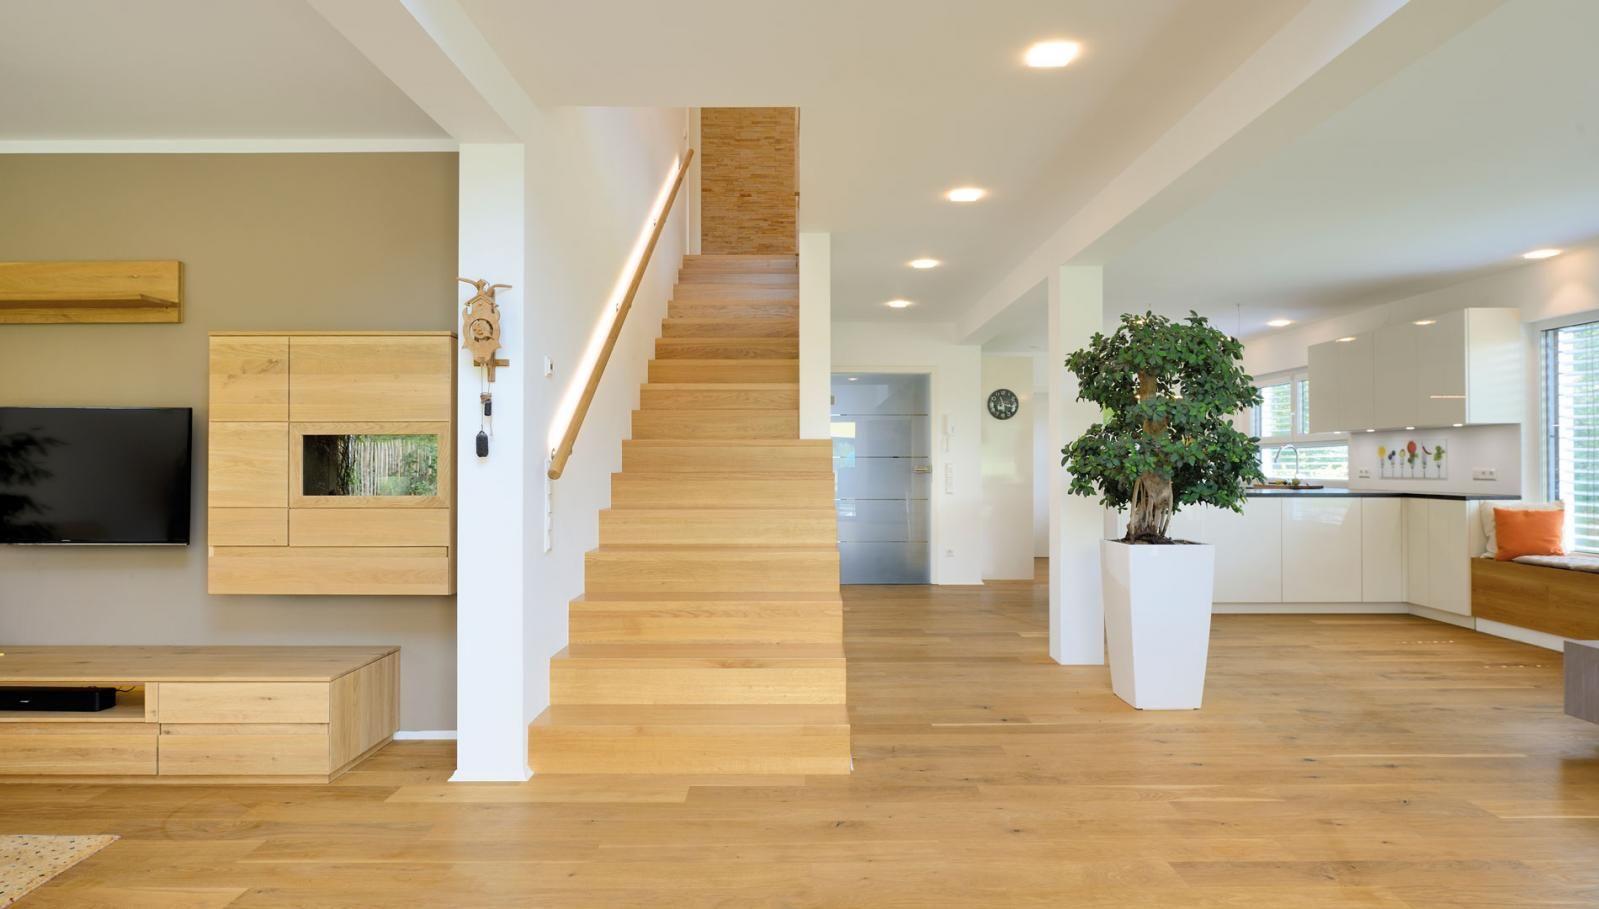 haus ingelfinger bau pinterest haus haus ideen und treppe haus. Black Bedroom Furniture Sets. Home Design Ideas